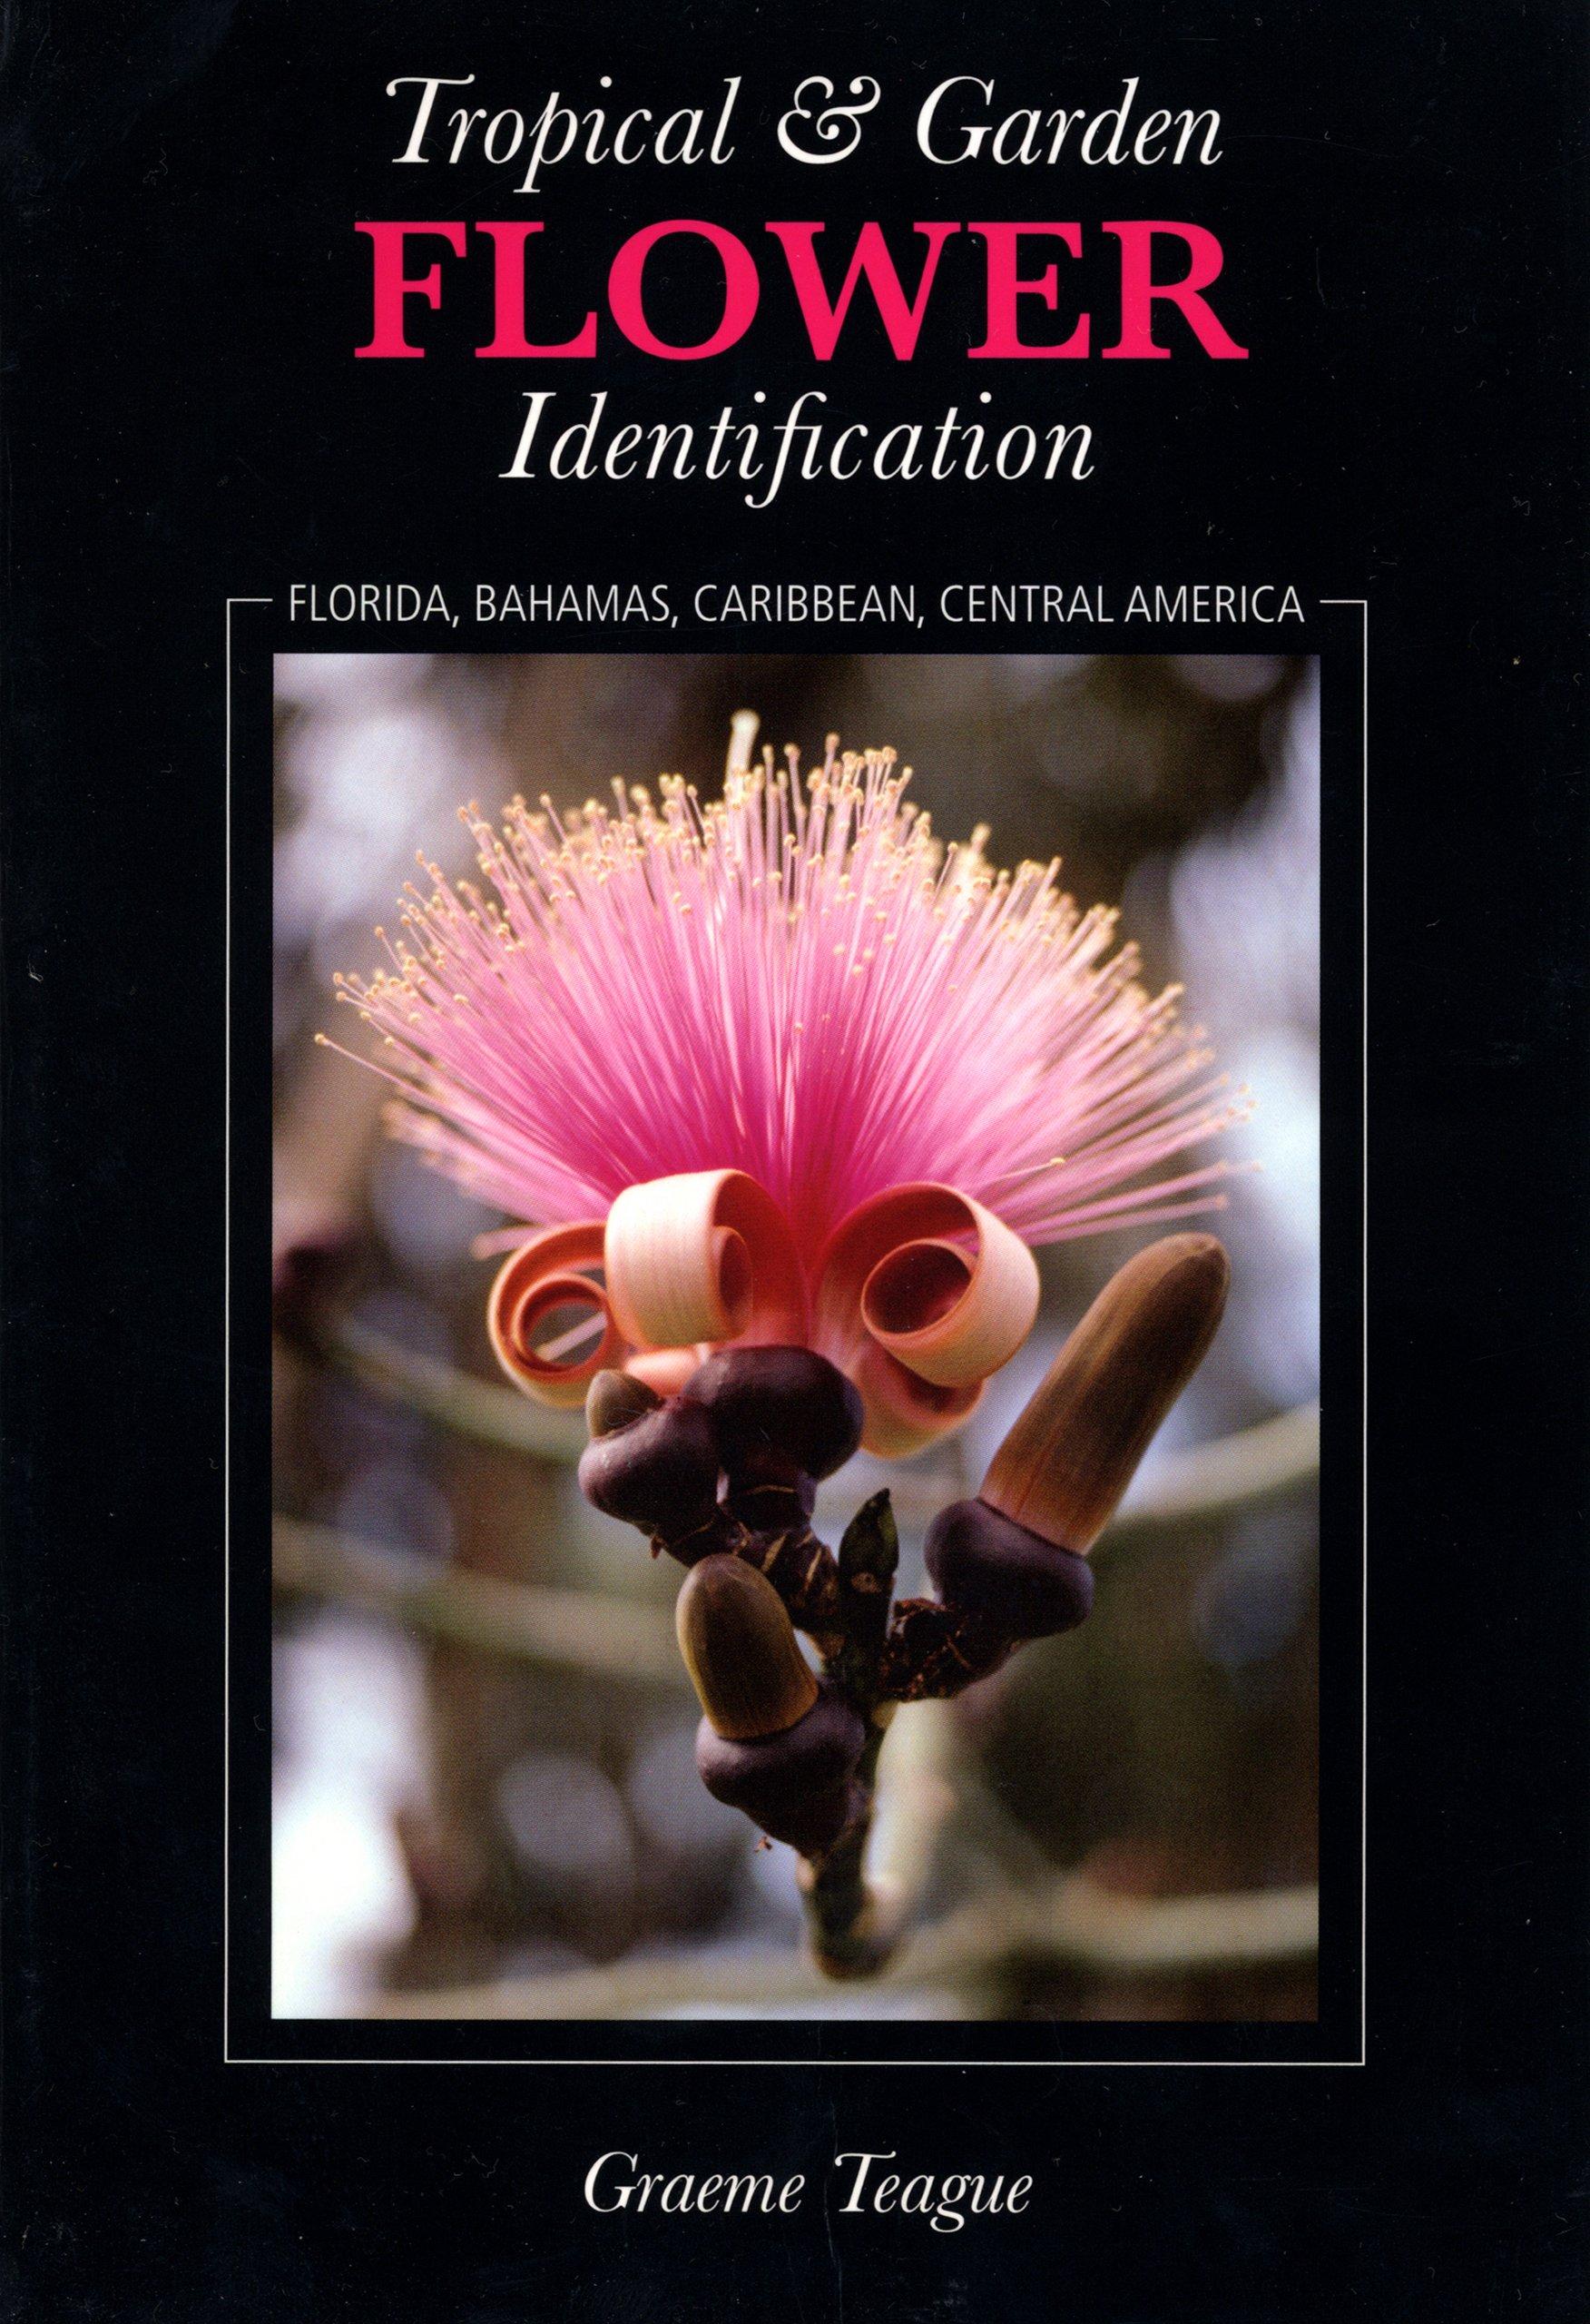 Tropical & Garden Flower Identification